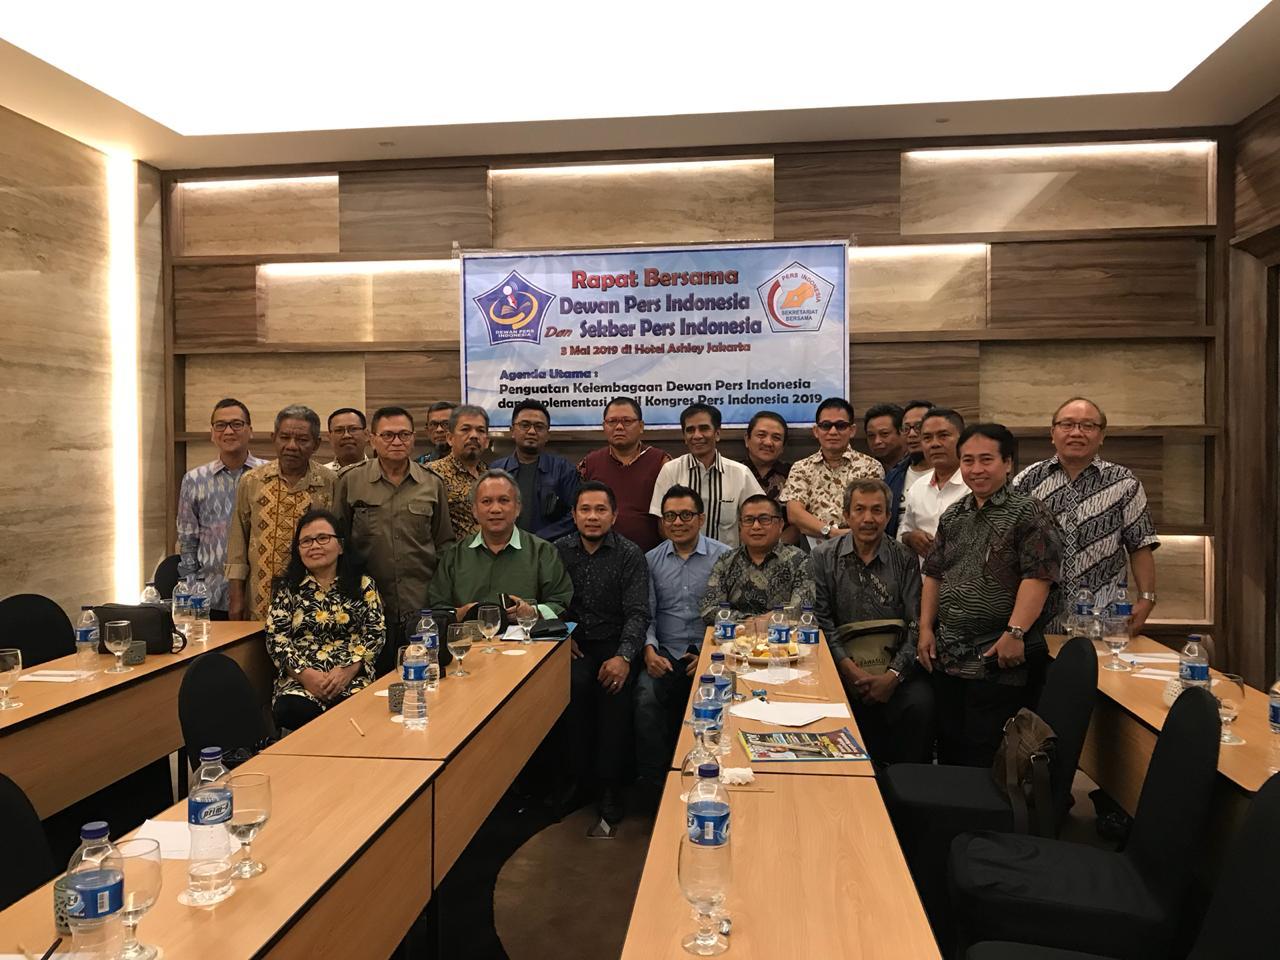 Kpd Yth: Pimpinan Media dan Wartawan